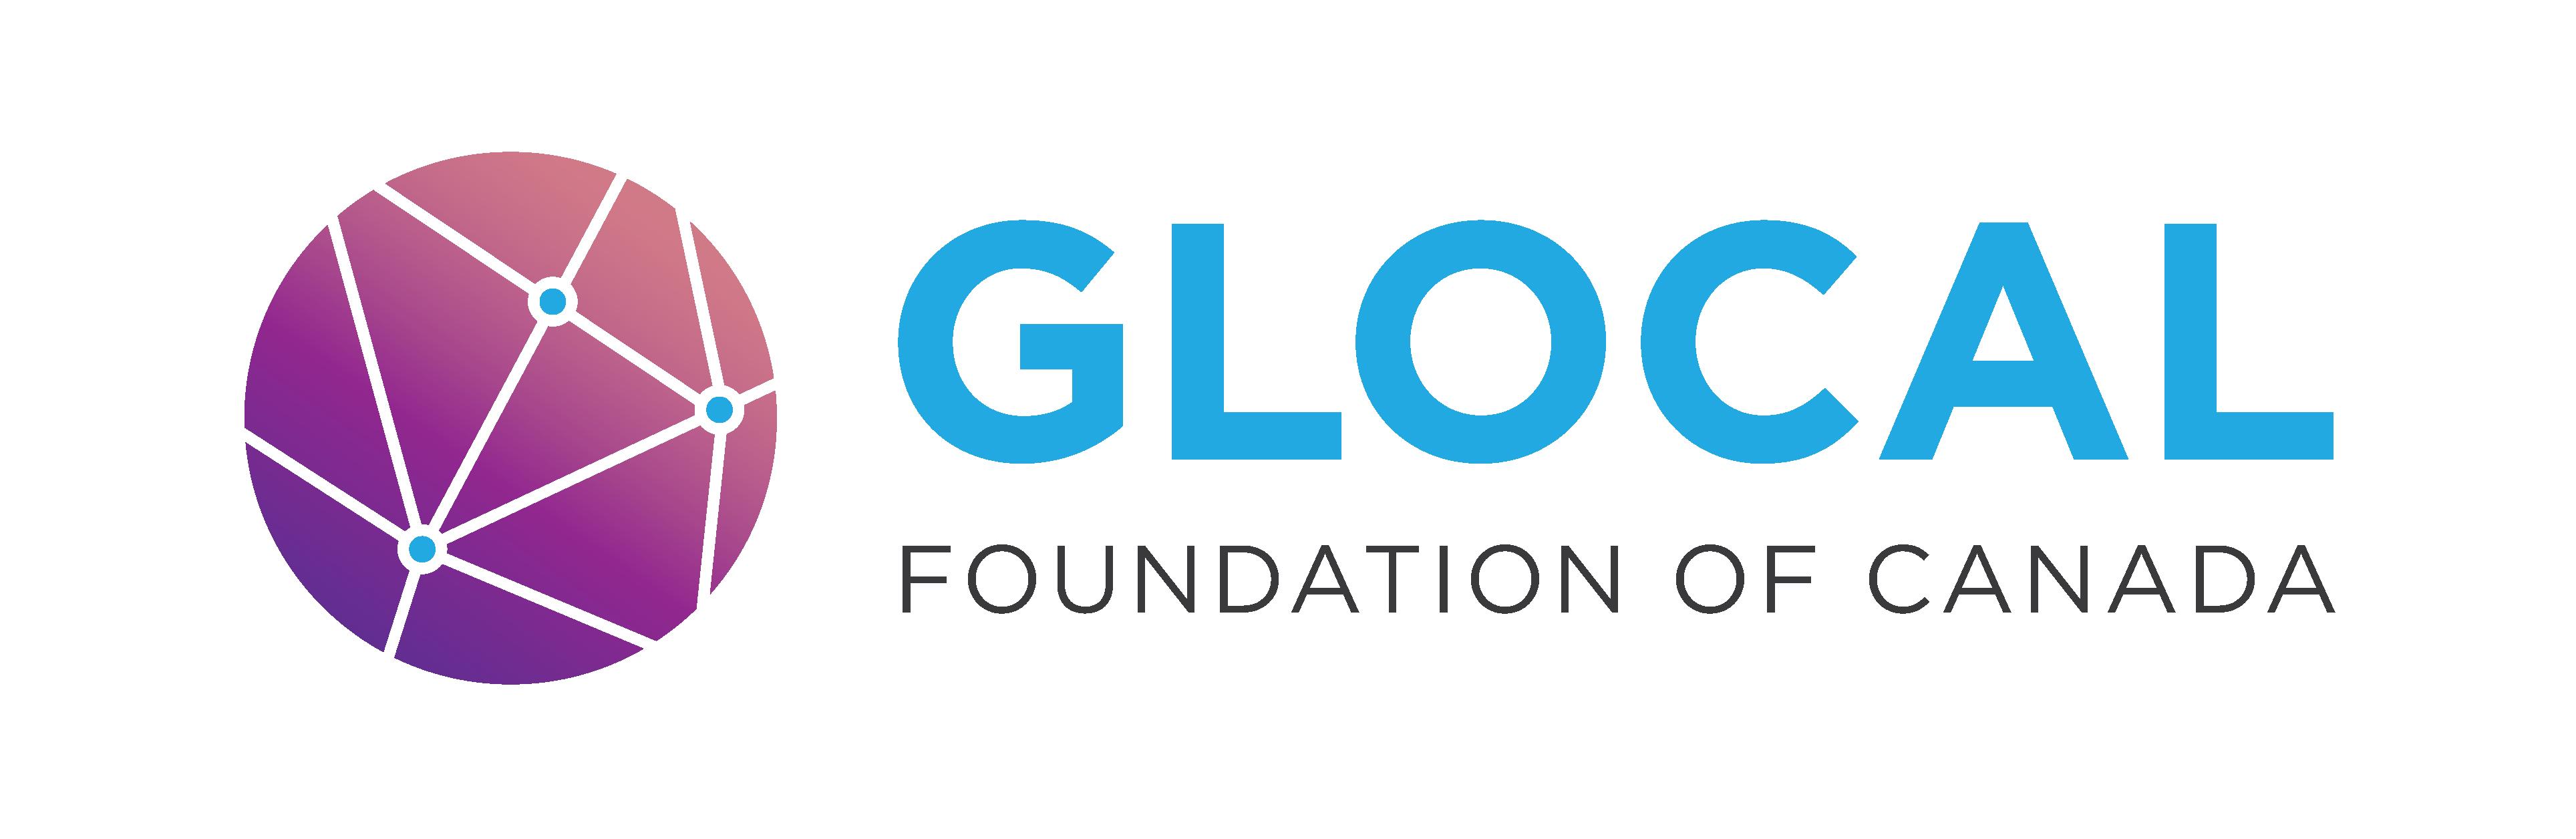 GLOCAL Foundation of Canada Logo